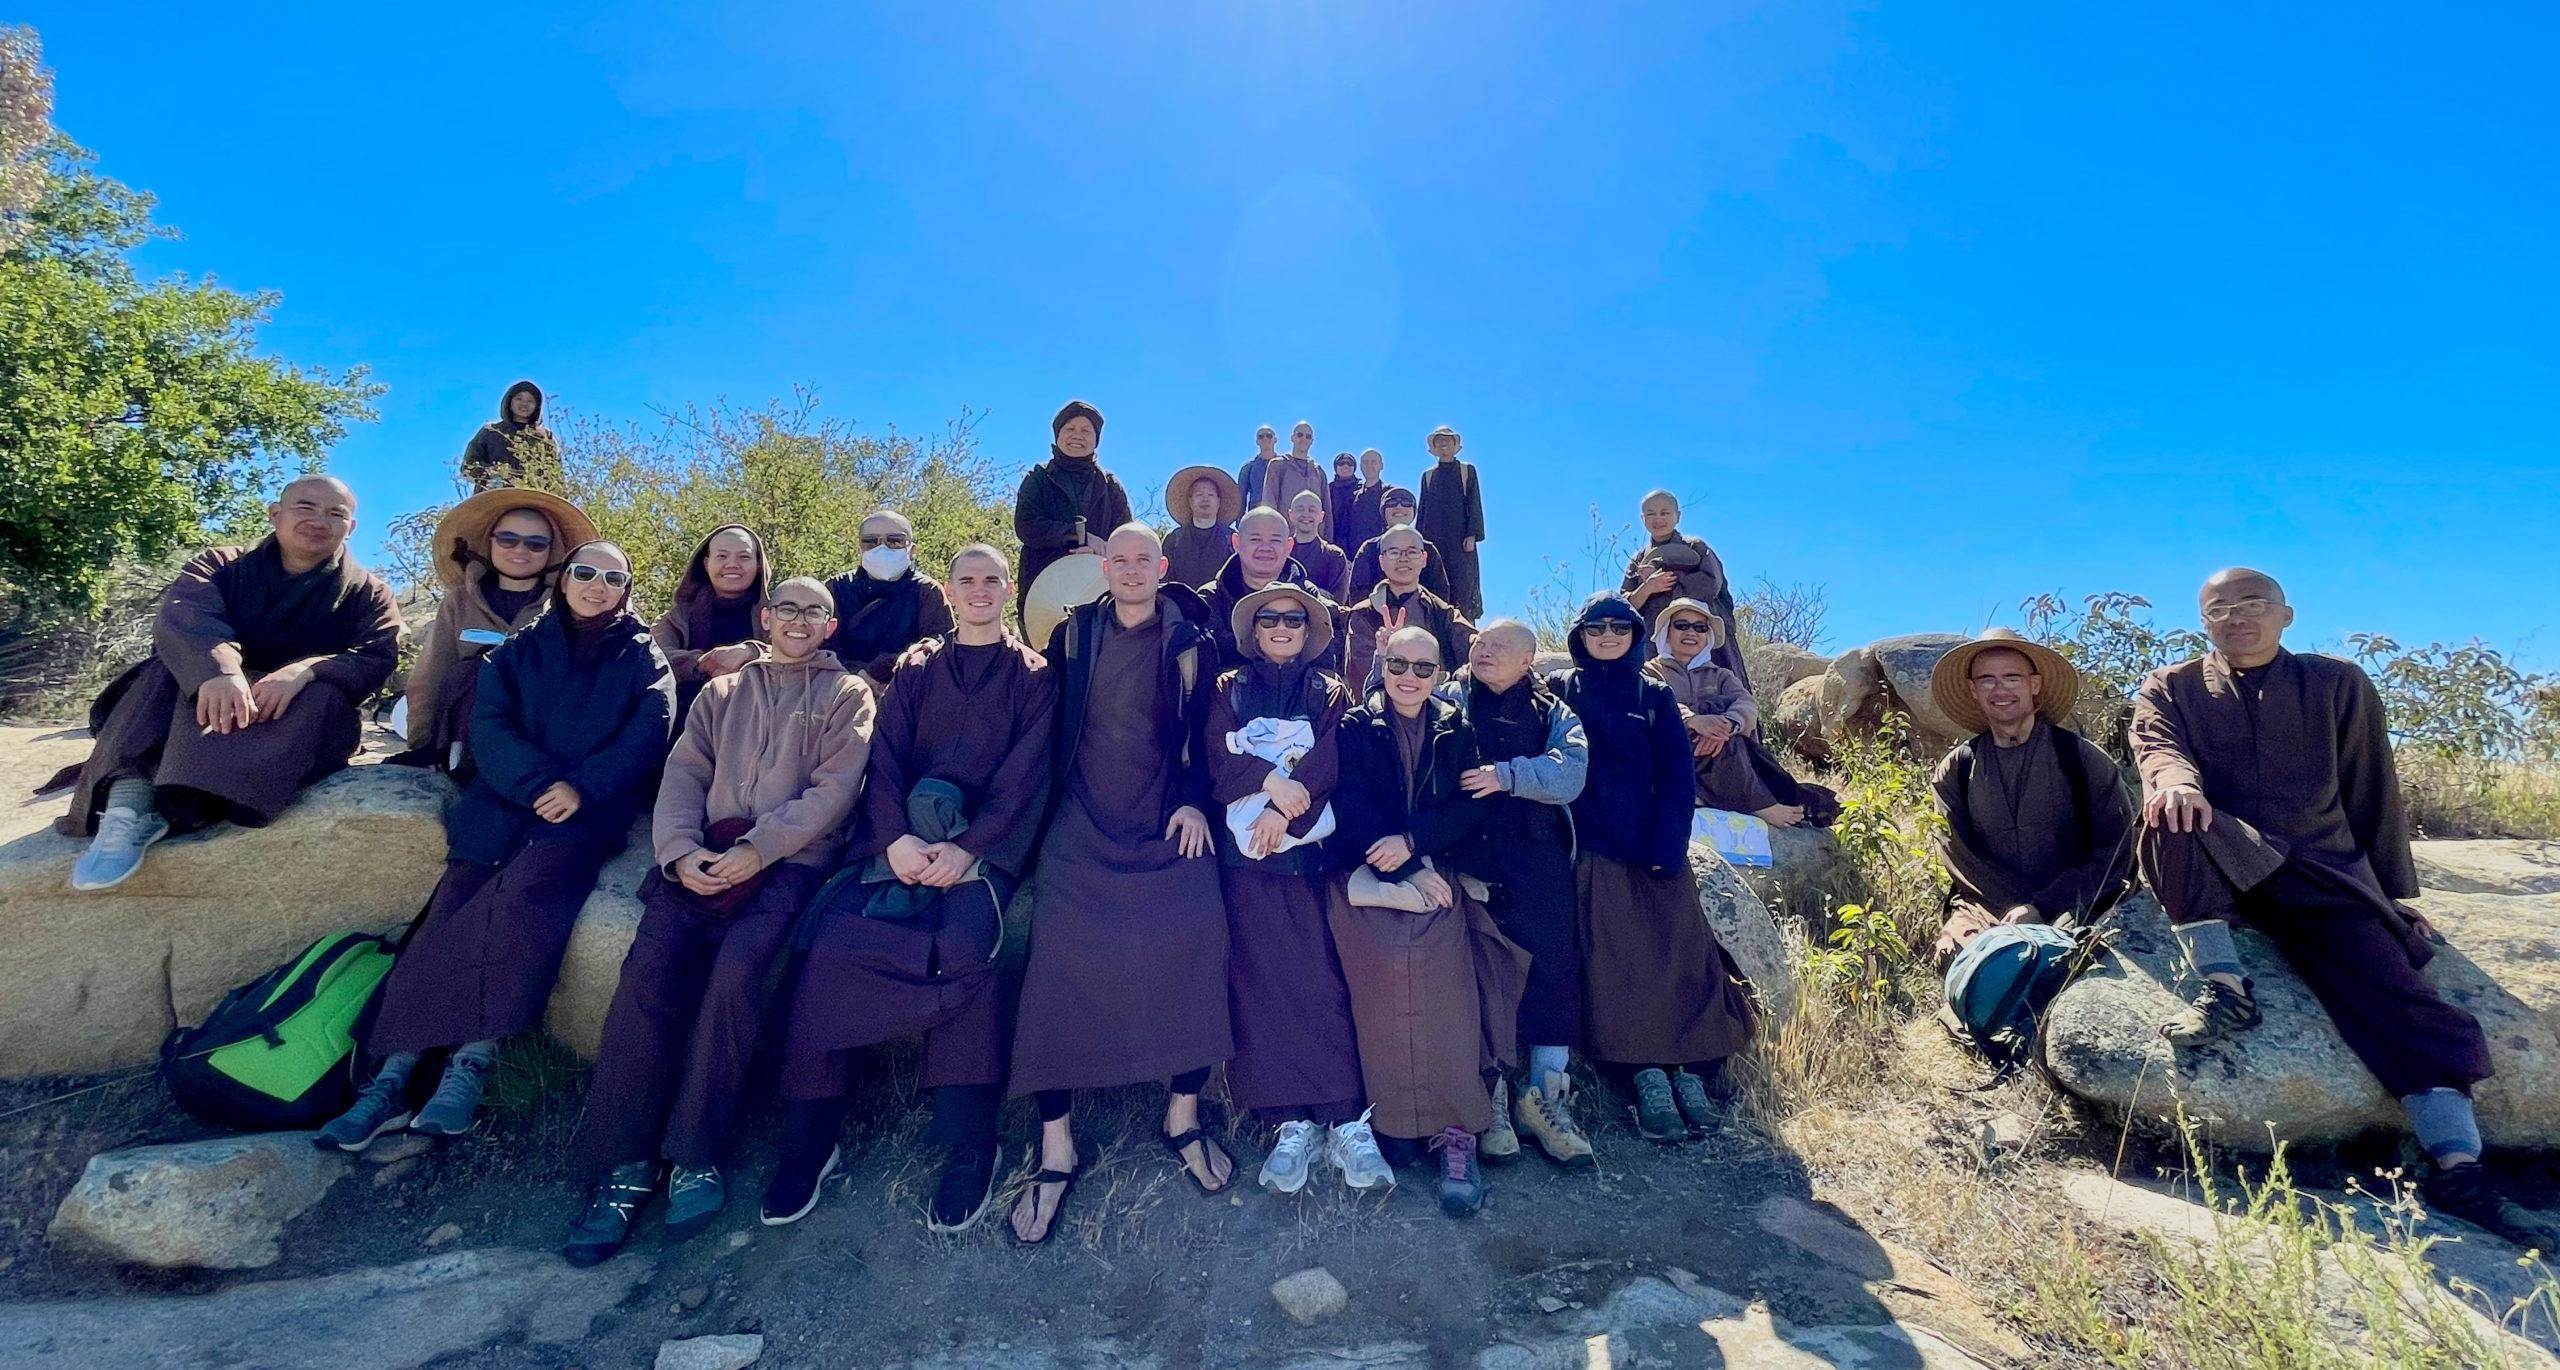 Monastic Sangha on the Mountain